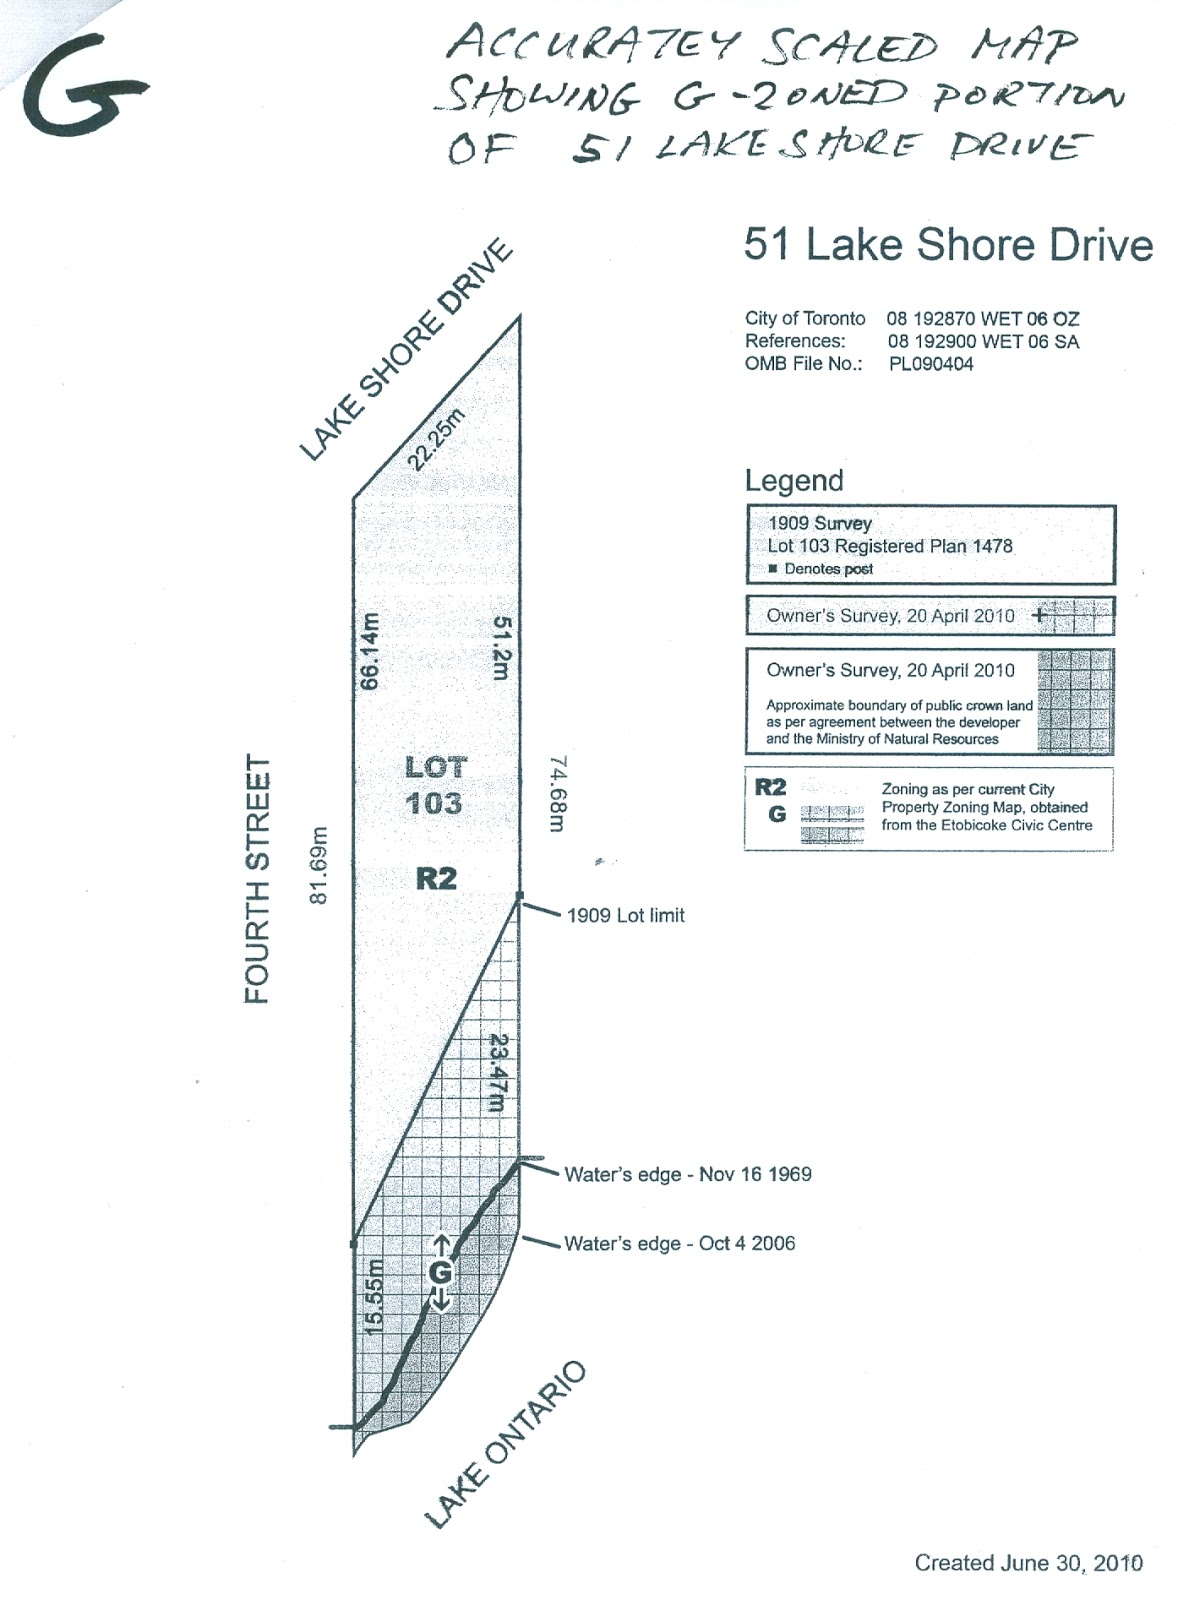 51 LAKE SHORE DRIVE: MR. ZANINI (DUNPAR) IS GRANTED